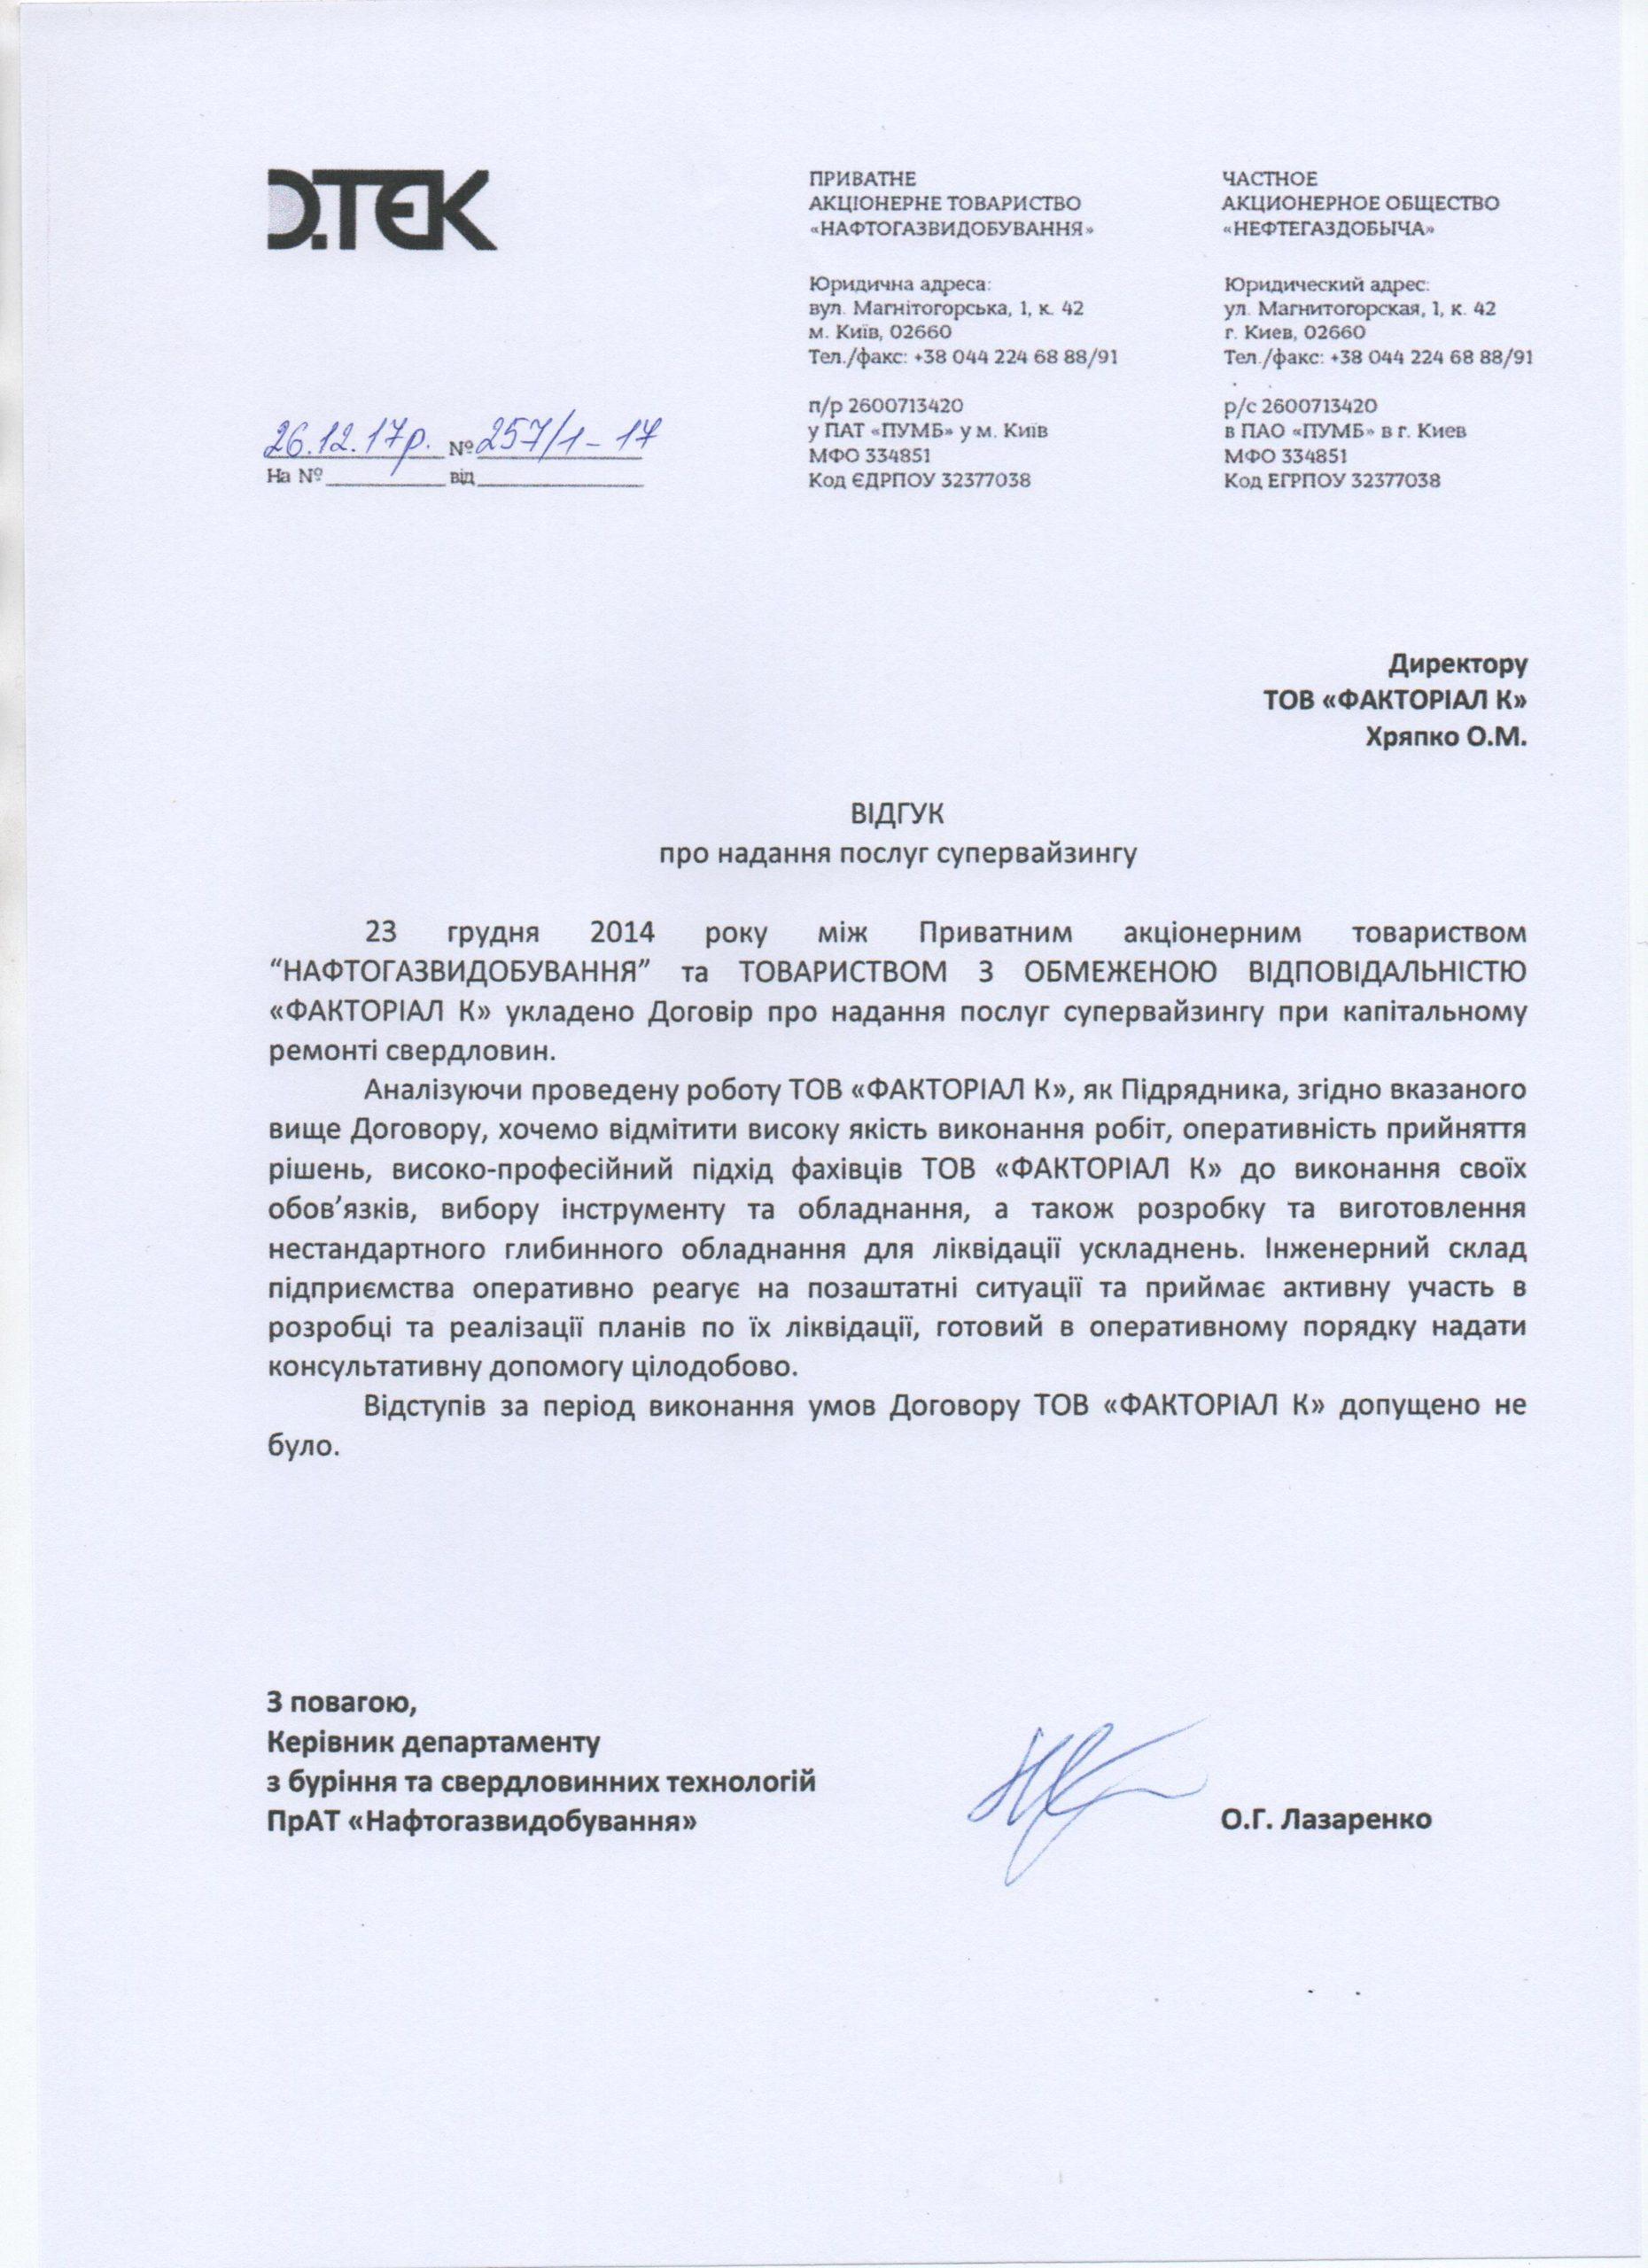 DTEK_response